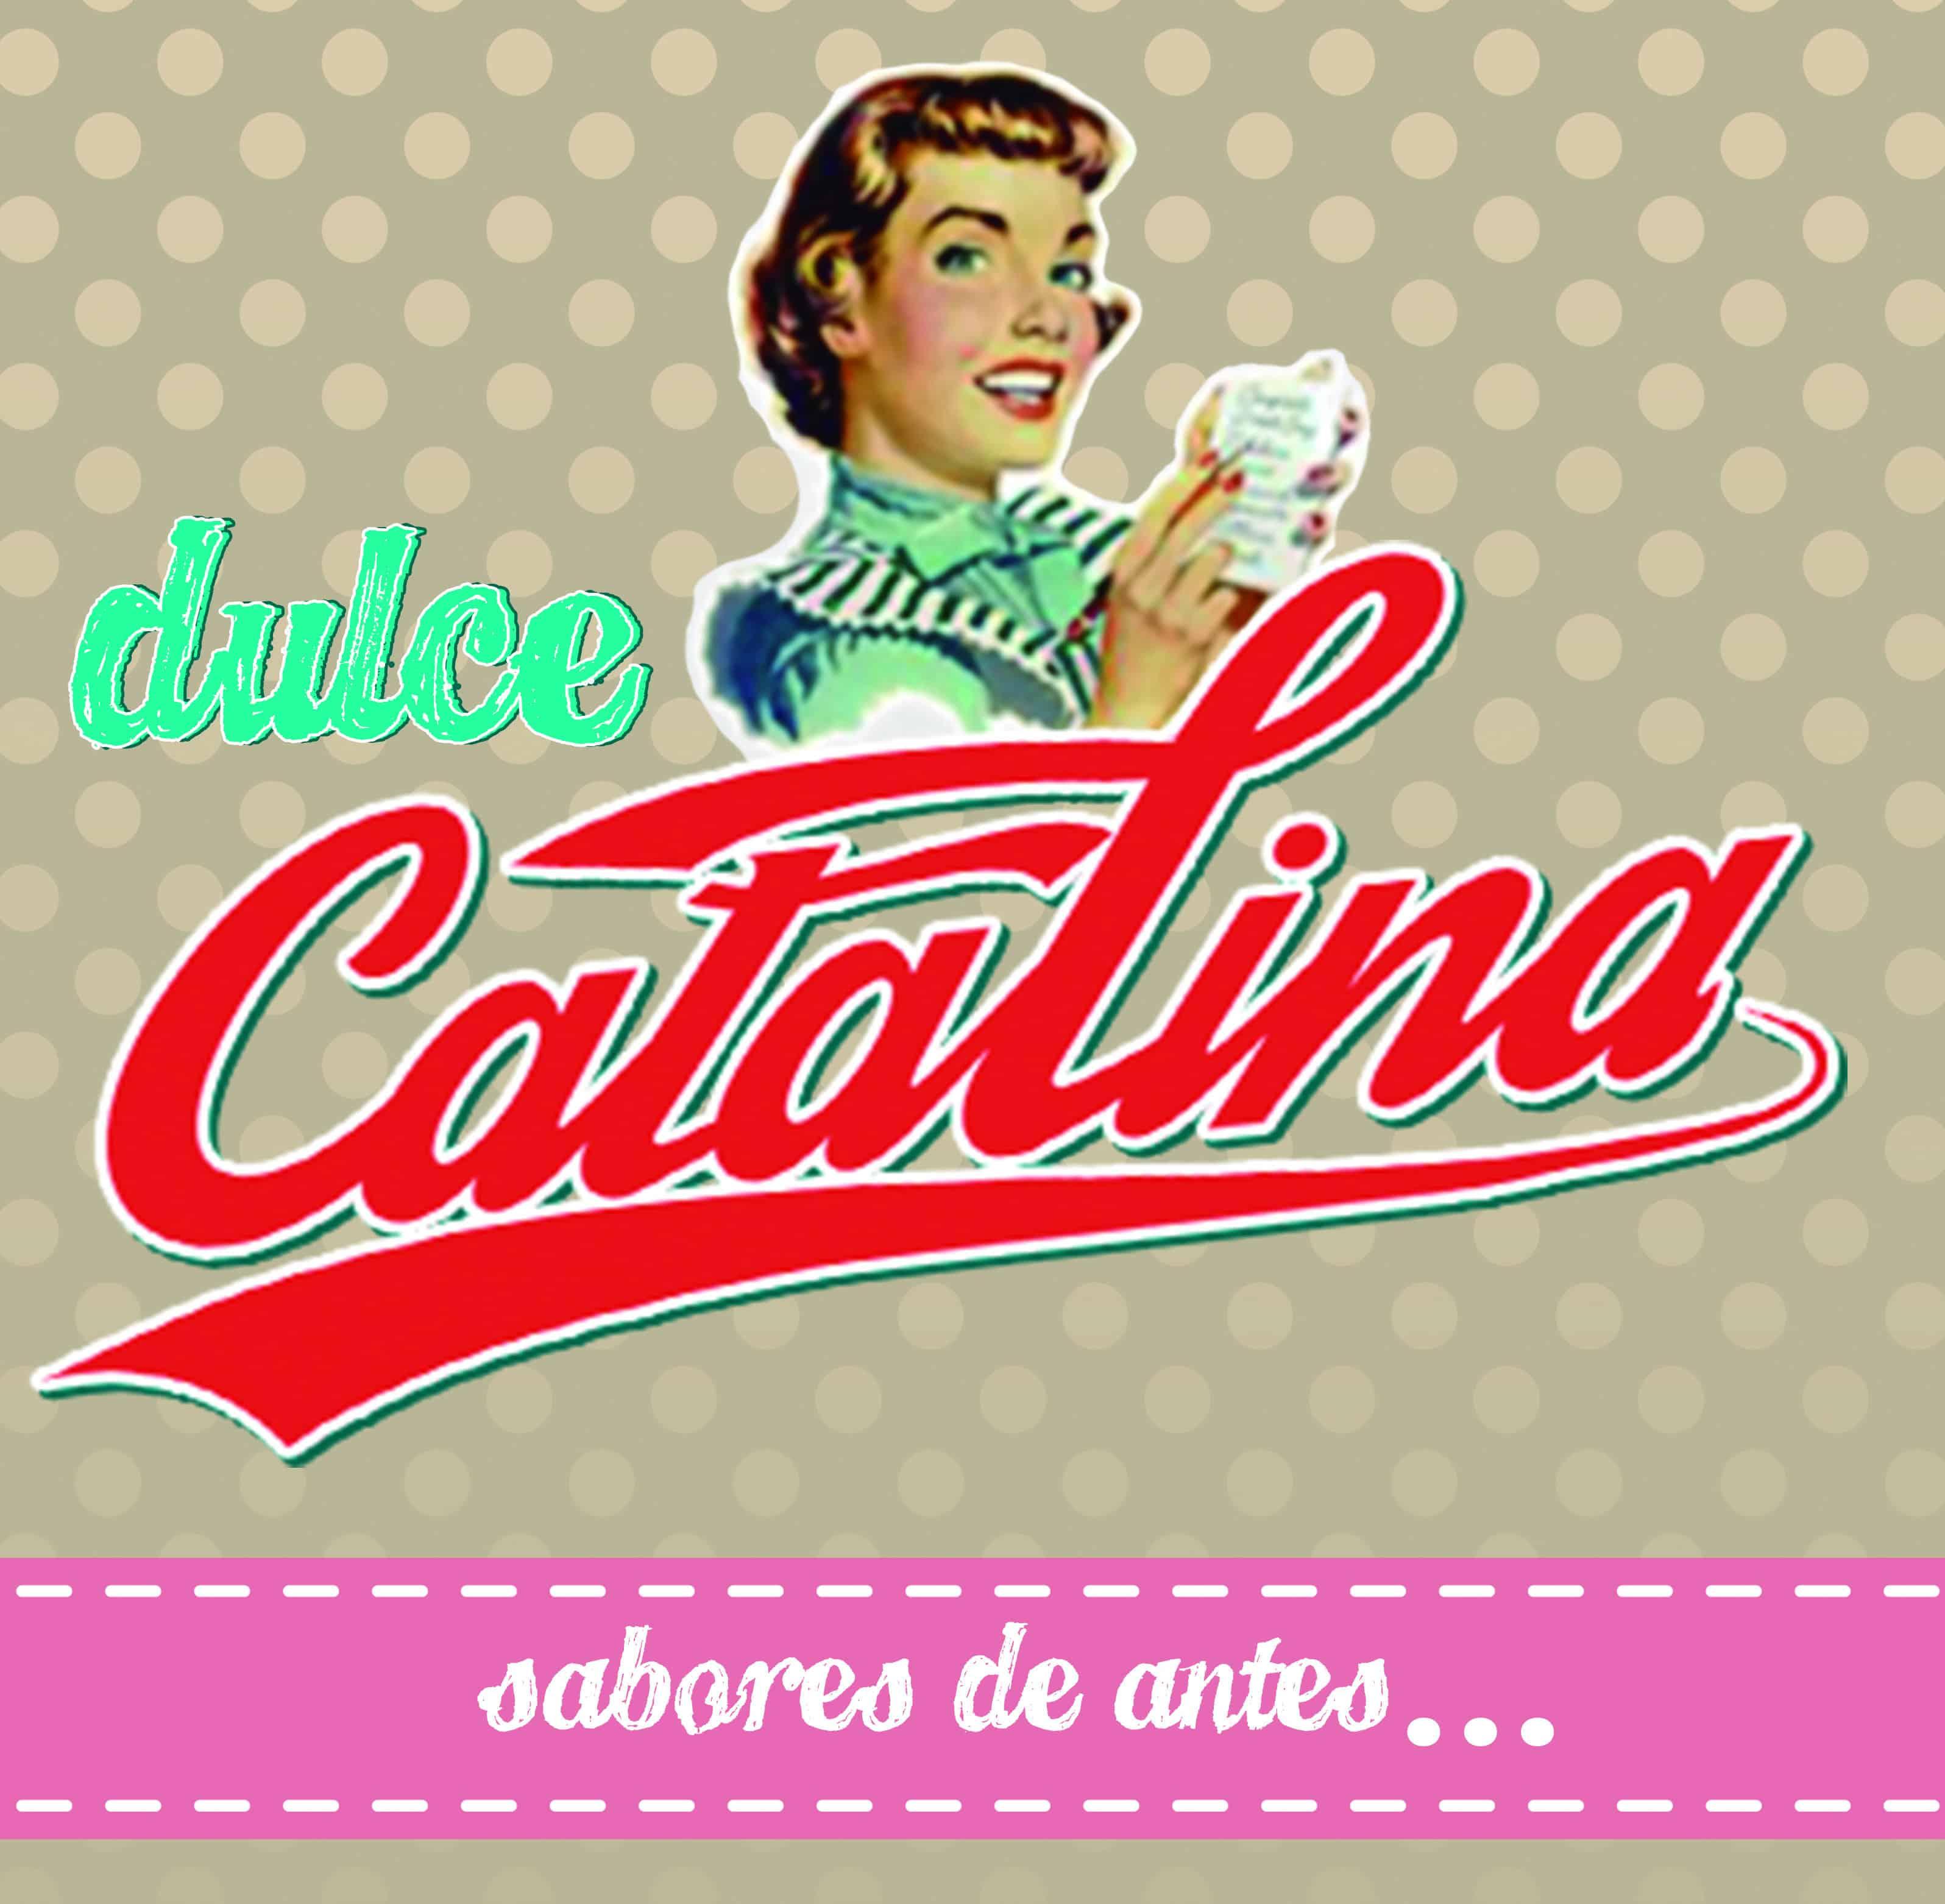 Dulce Catalina